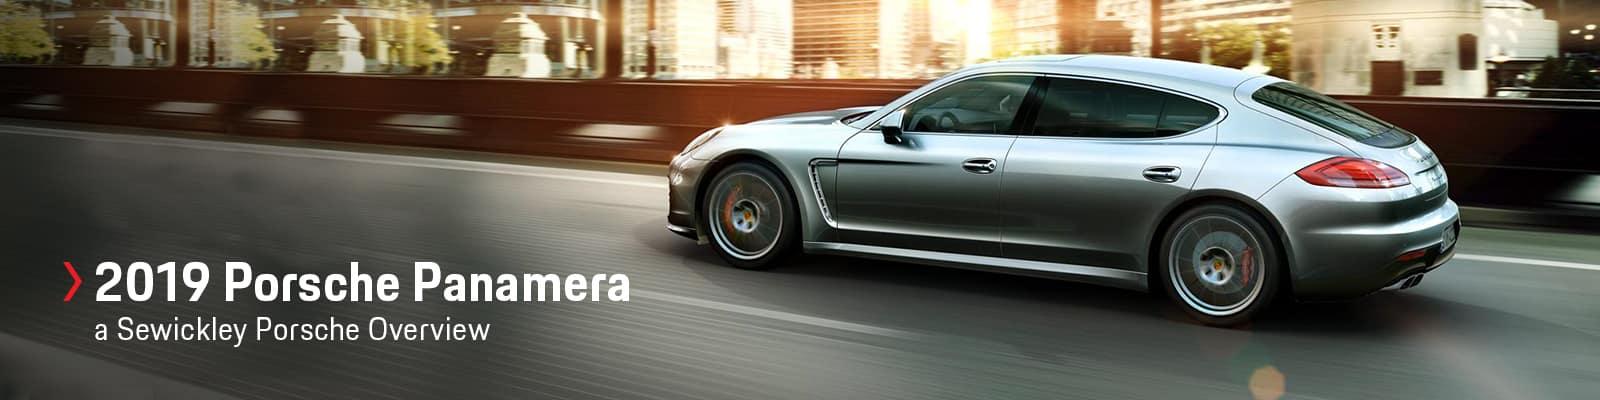 2019 Porsche Panamera Model Review